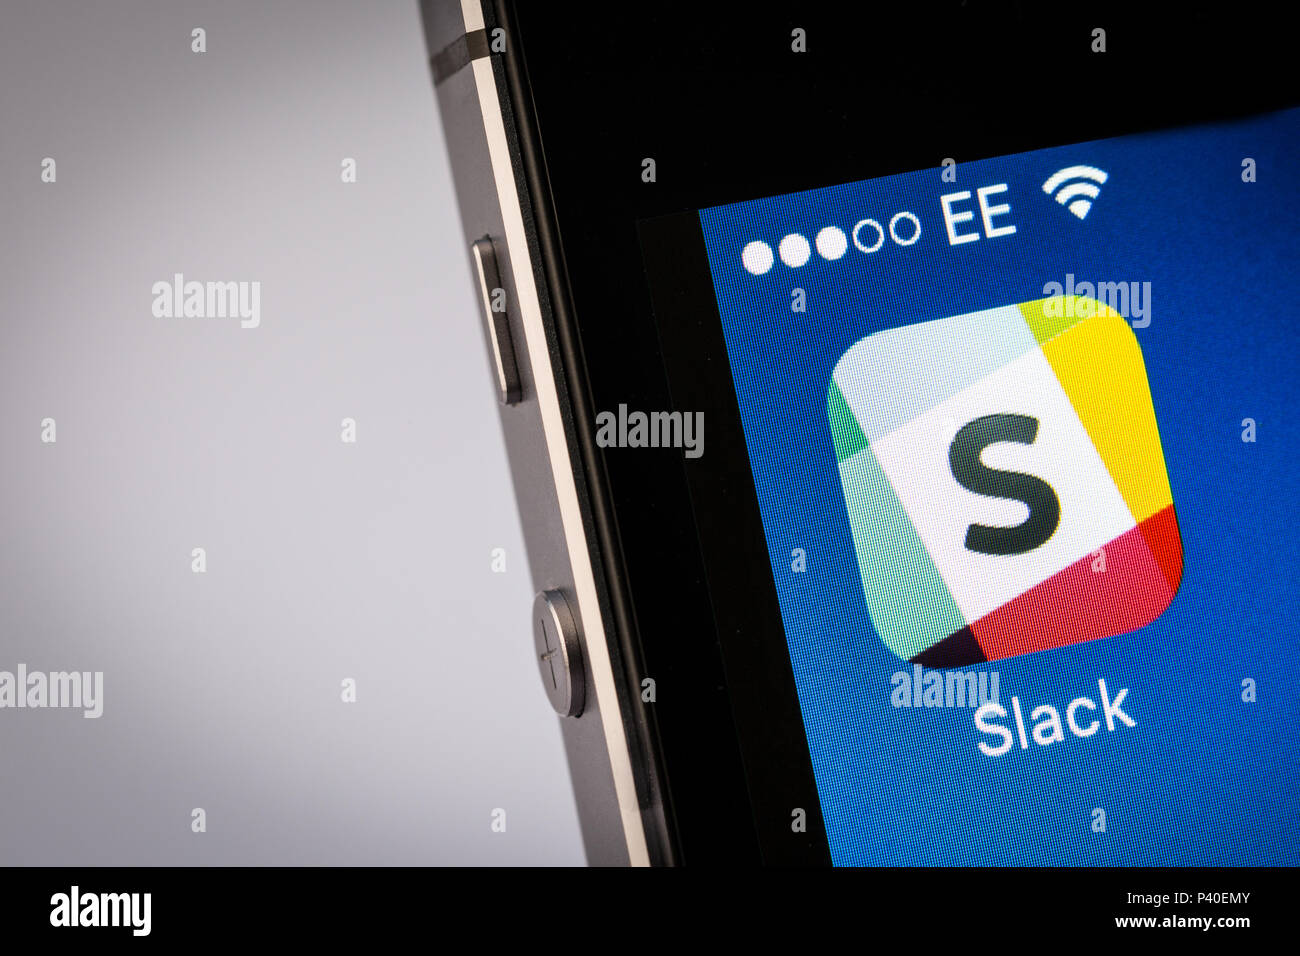 Slack App on an iPhone smartphone - Stock Image